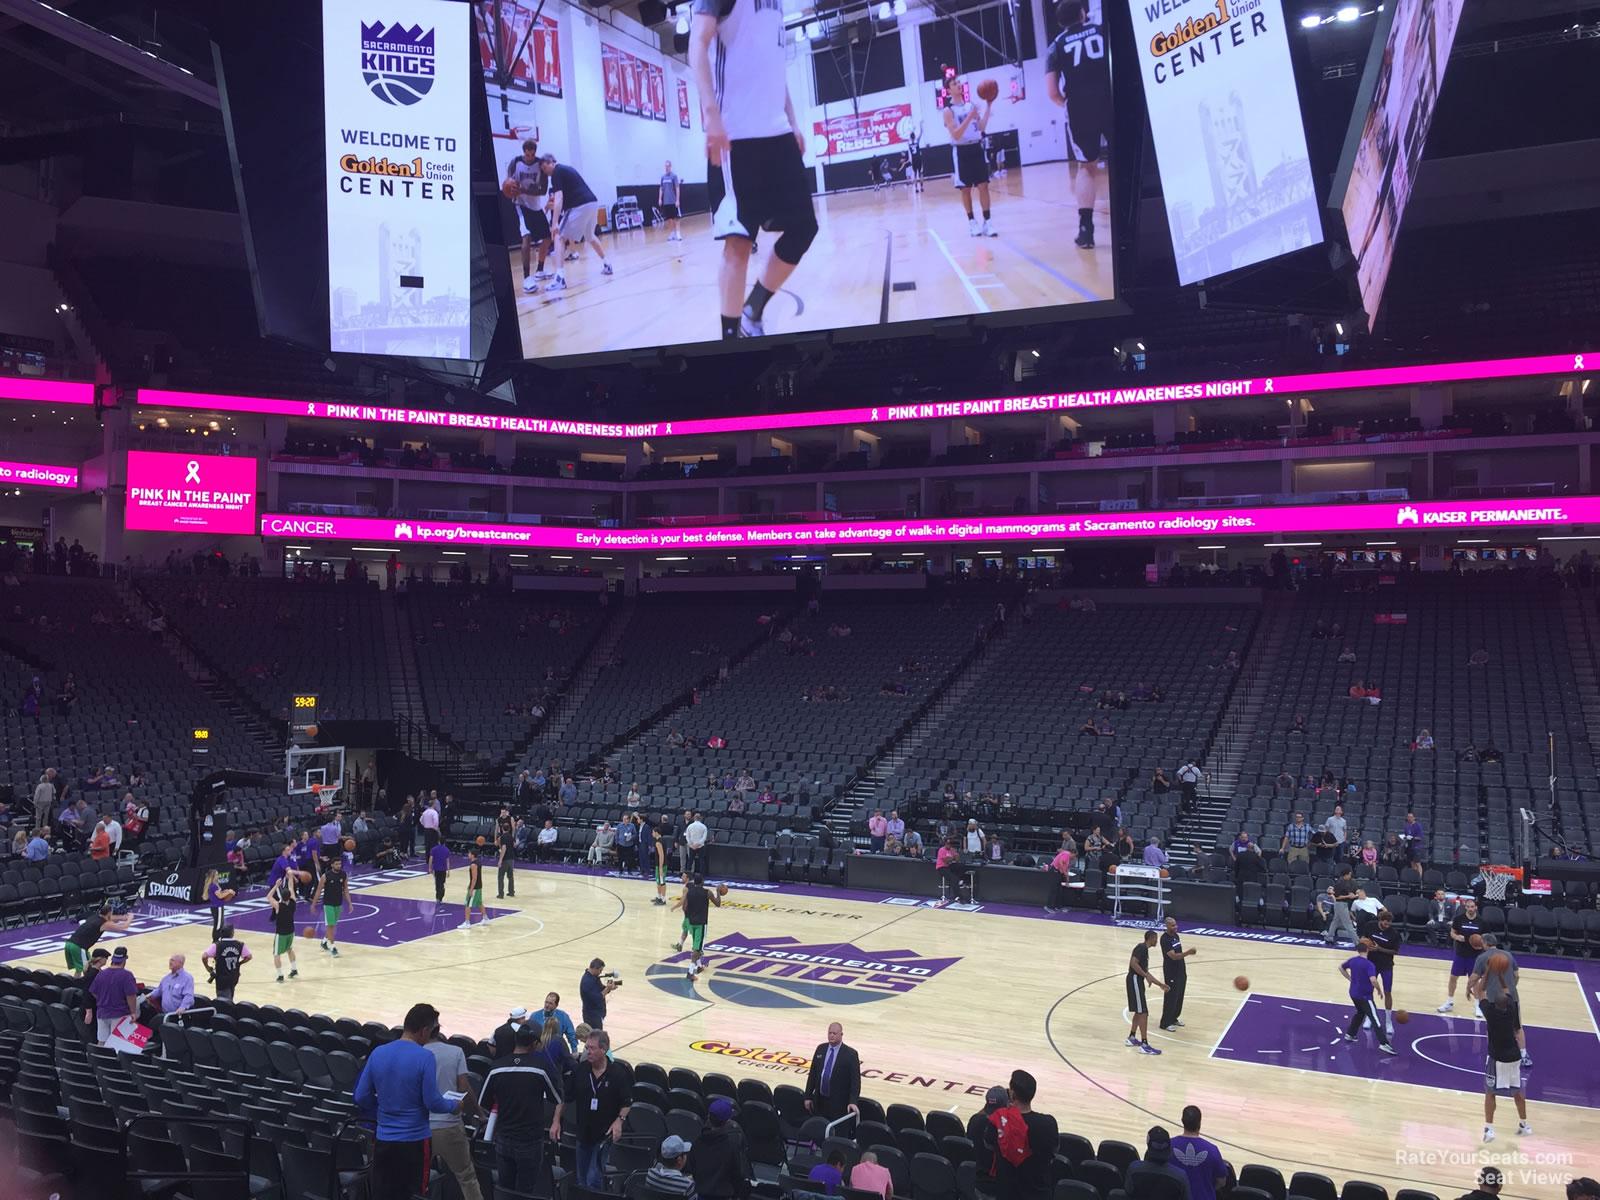 Aaa San Antonio >> Golden 1 Center Section 119 - Sacramento Kings ...